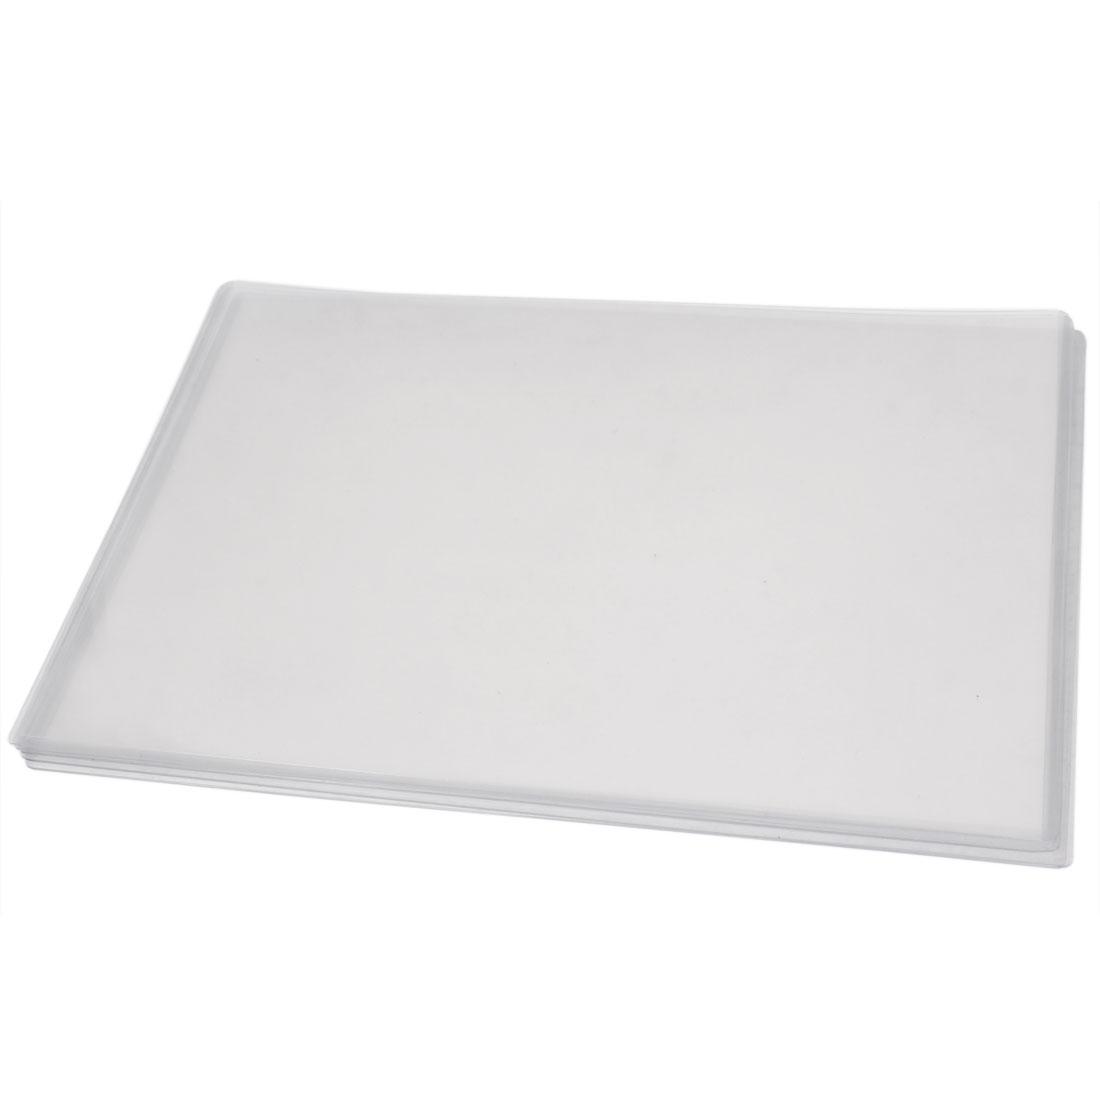 5PCS A3 Paper Clear Plastic Certificate Document Files Holder 420mm x 297mm